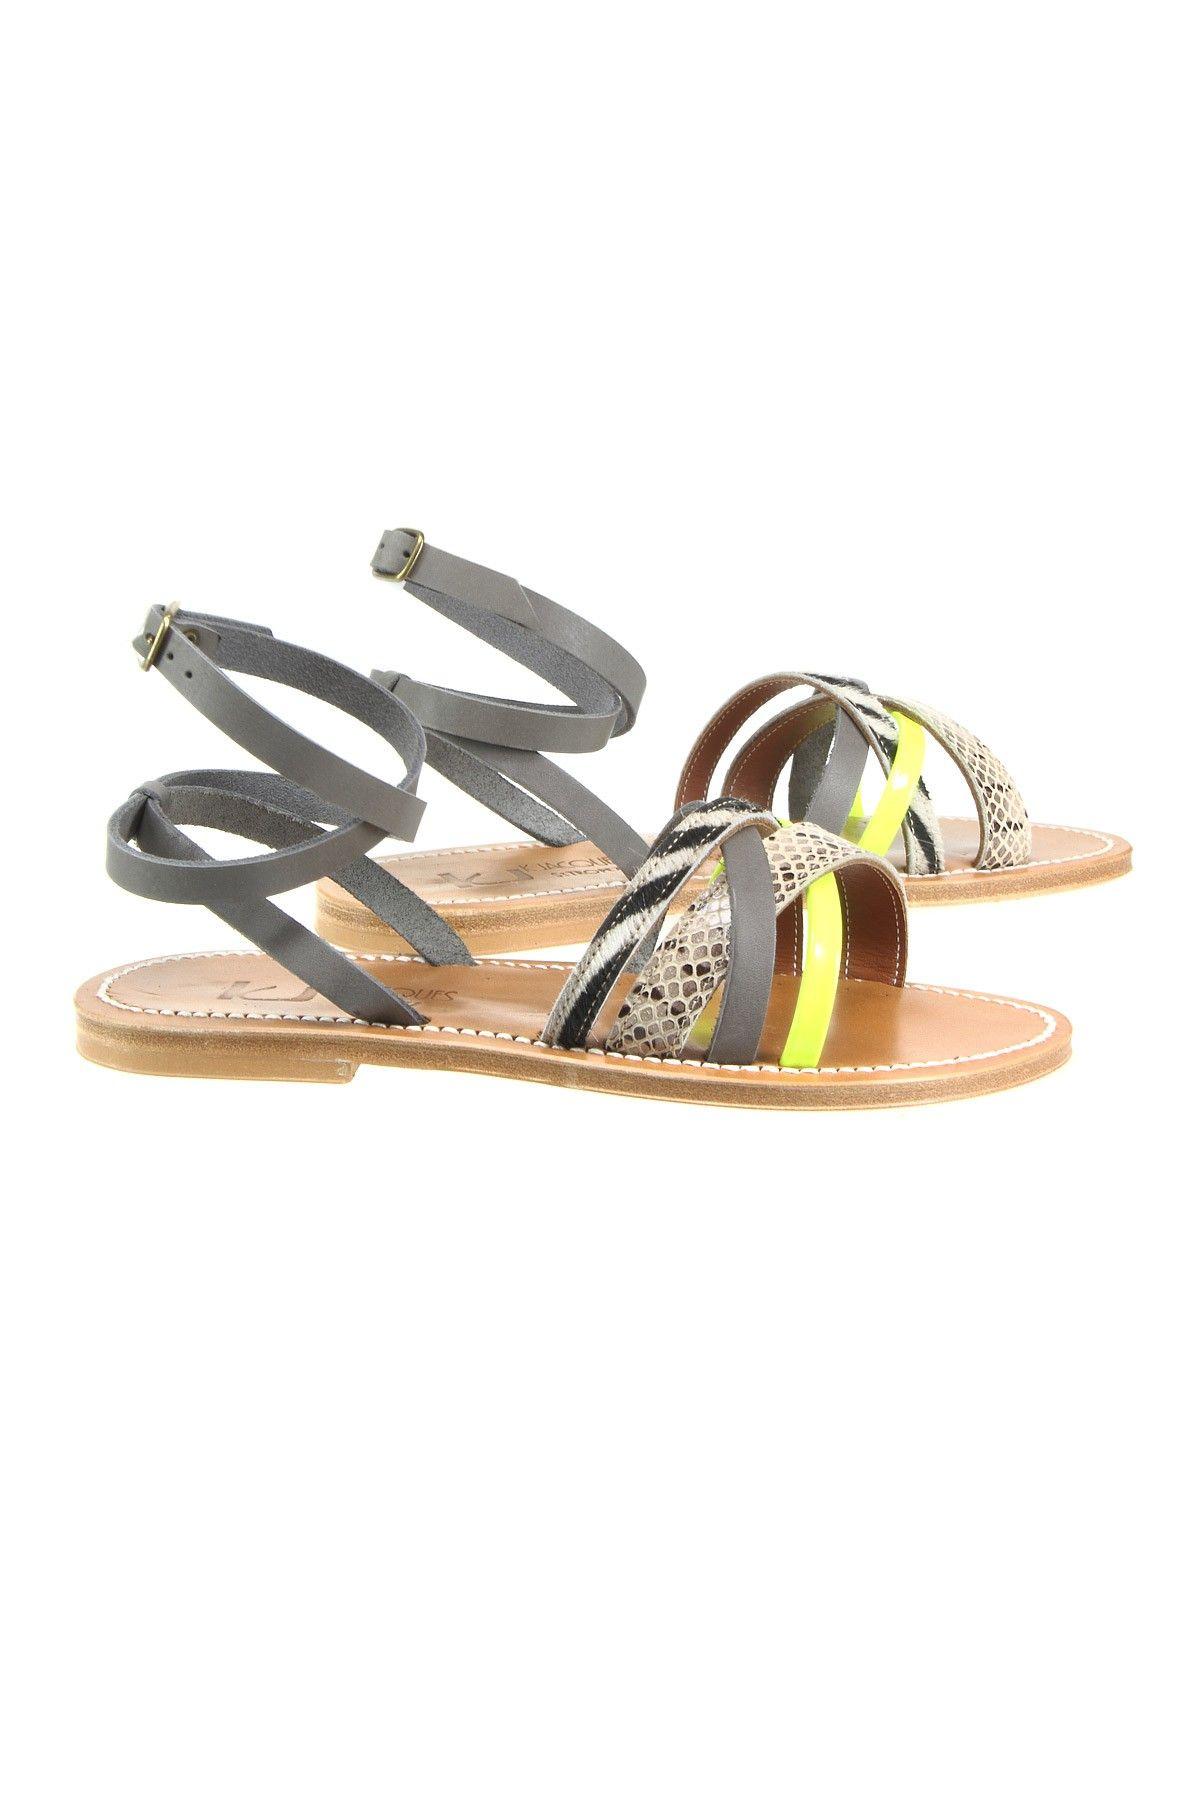 Sandales Galapagos Pul Gris - Kjacques